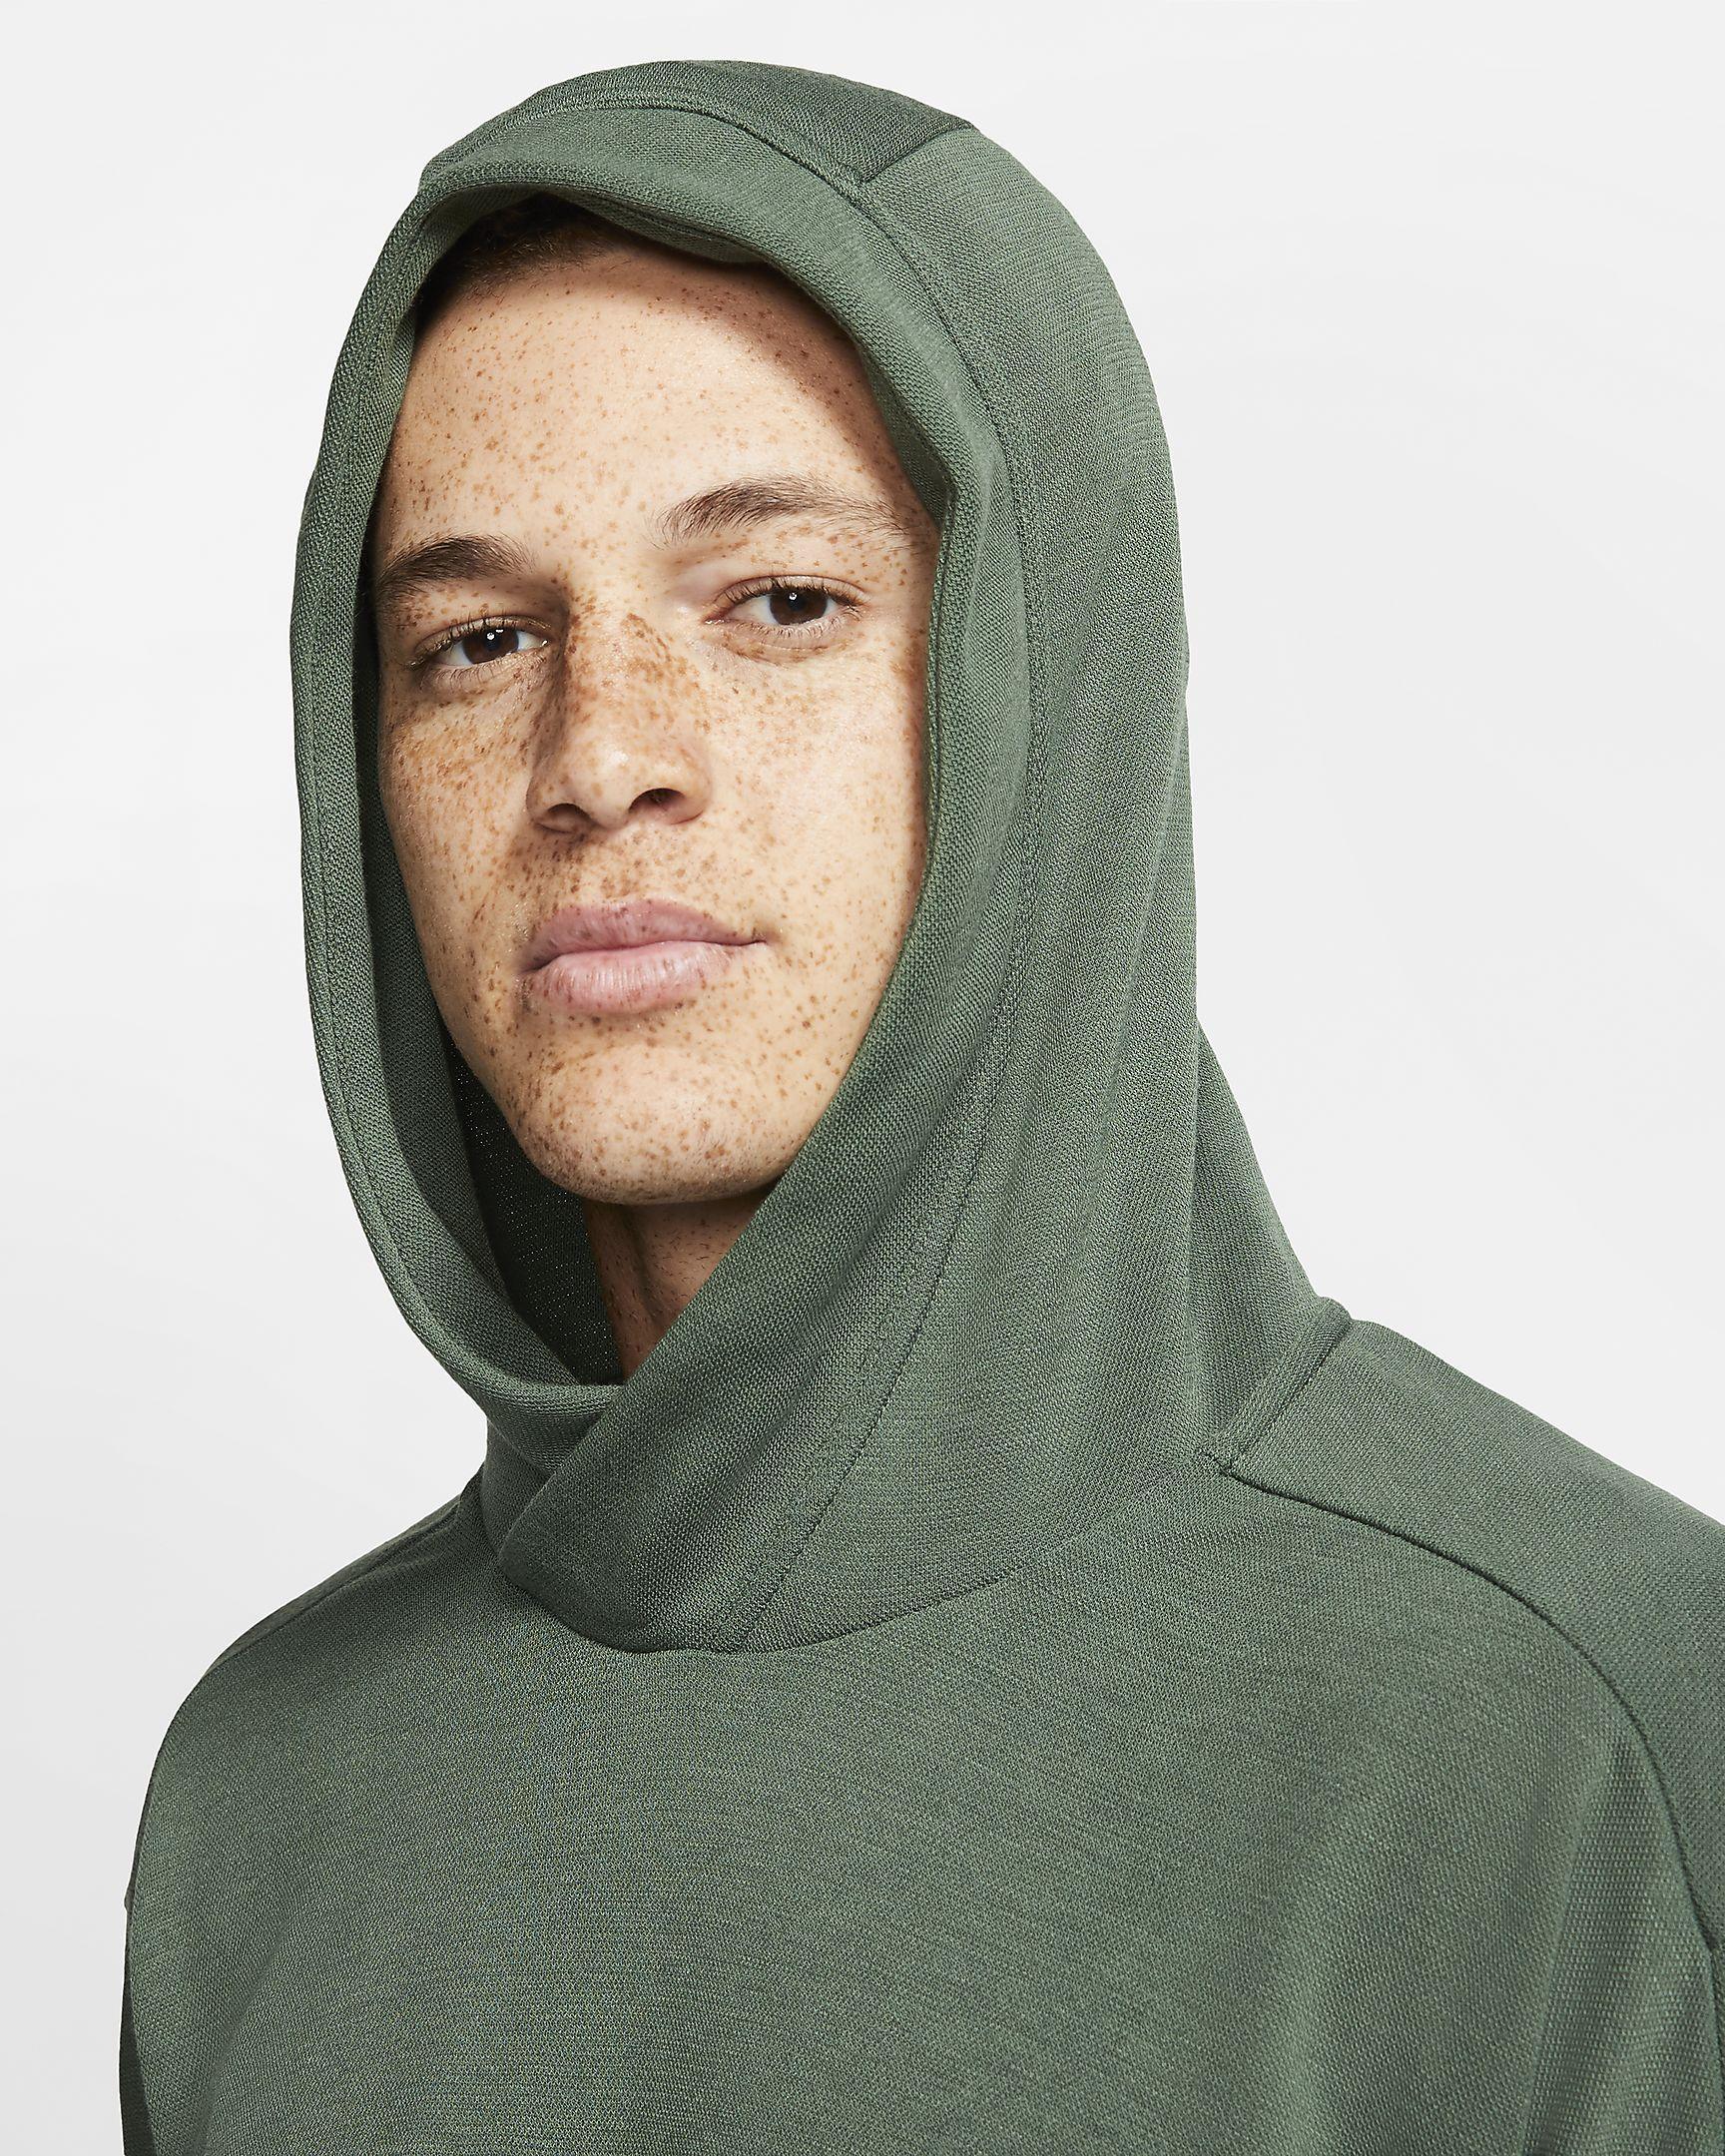 Nike Yoga Dri Fit Men S Pullover Hoodie Nike Com Hoodies Men Pullover Pullover Hoodie Nike Yoga [ 2160 x 1728 Pixel ]